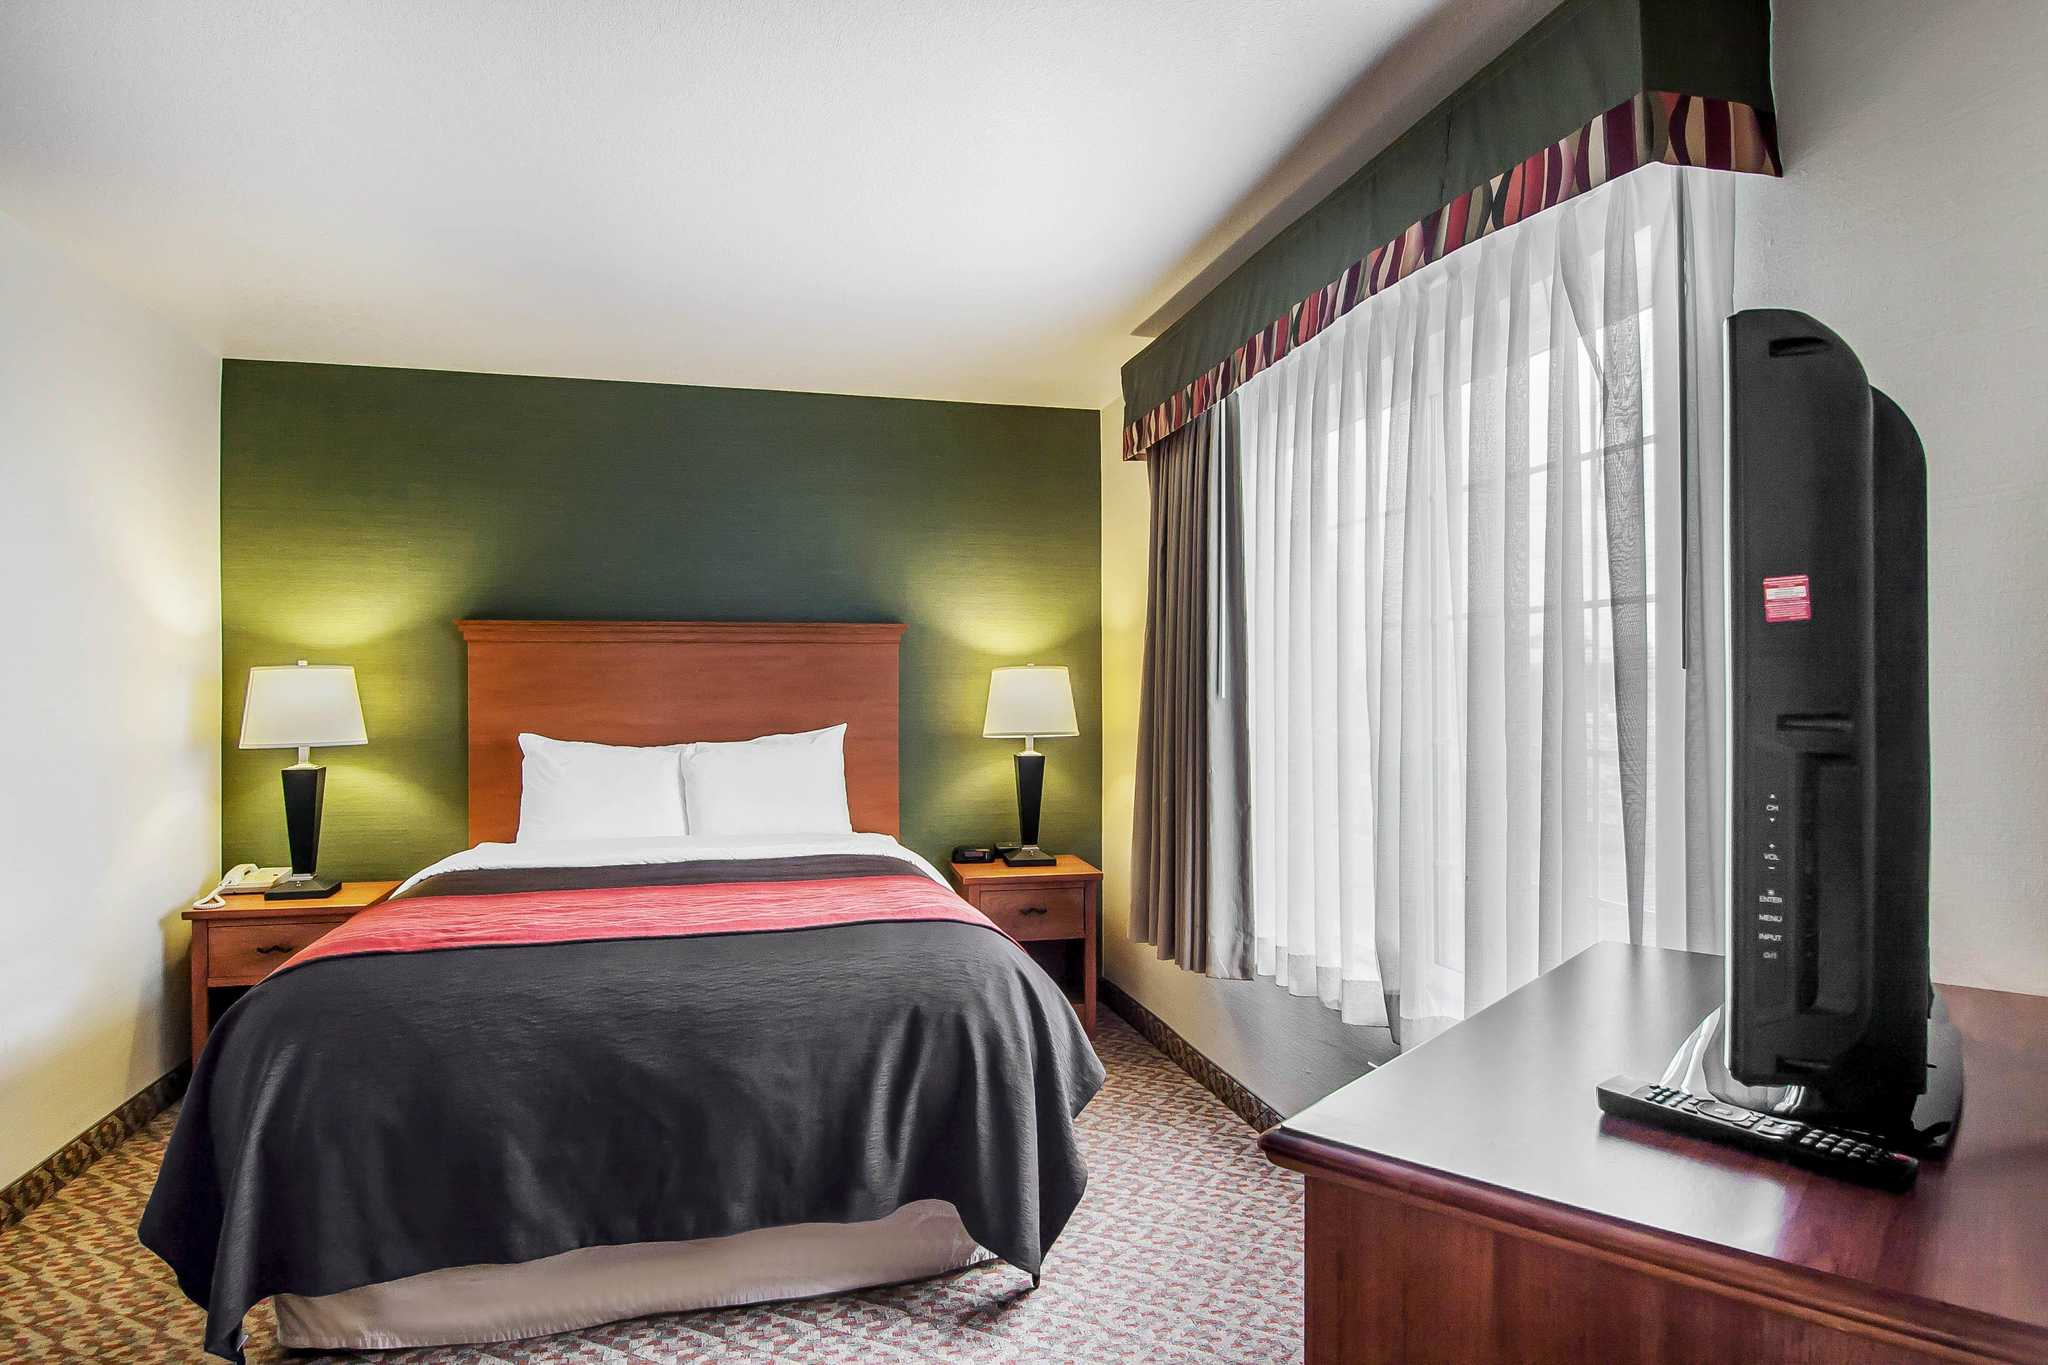 Comfort Inn & Suites image 49